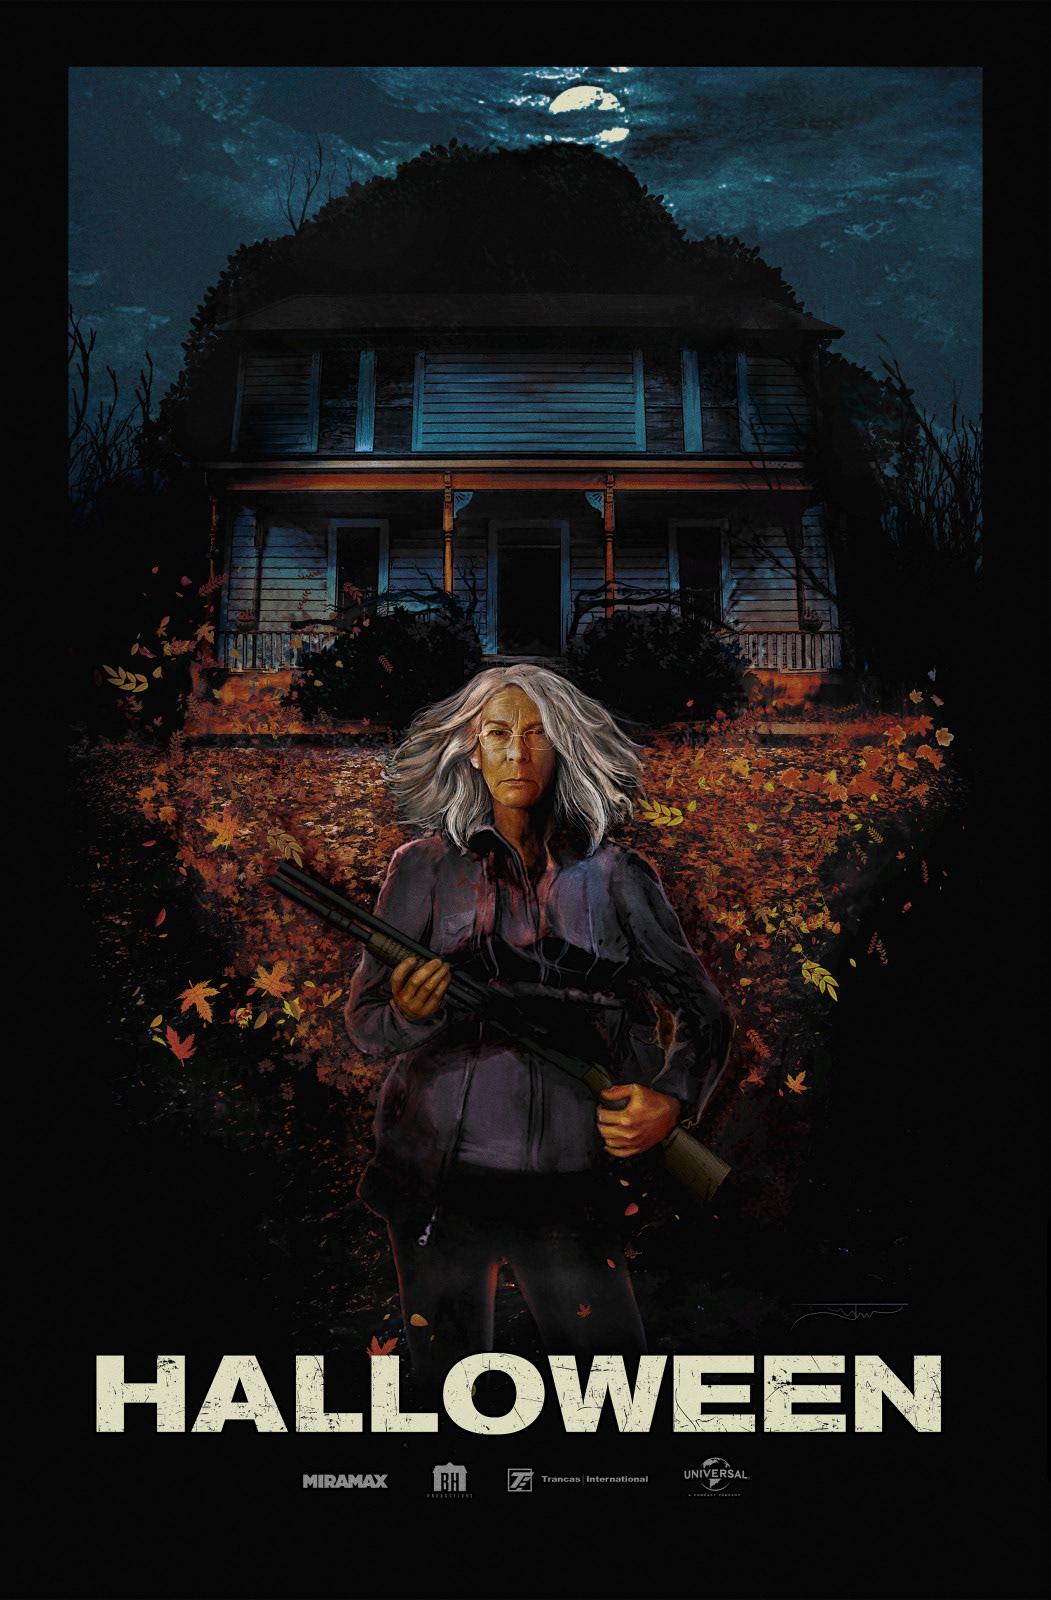 Halloween Poster Art.Halloween Alternative Movie Poster By Juan Ramos On Behance